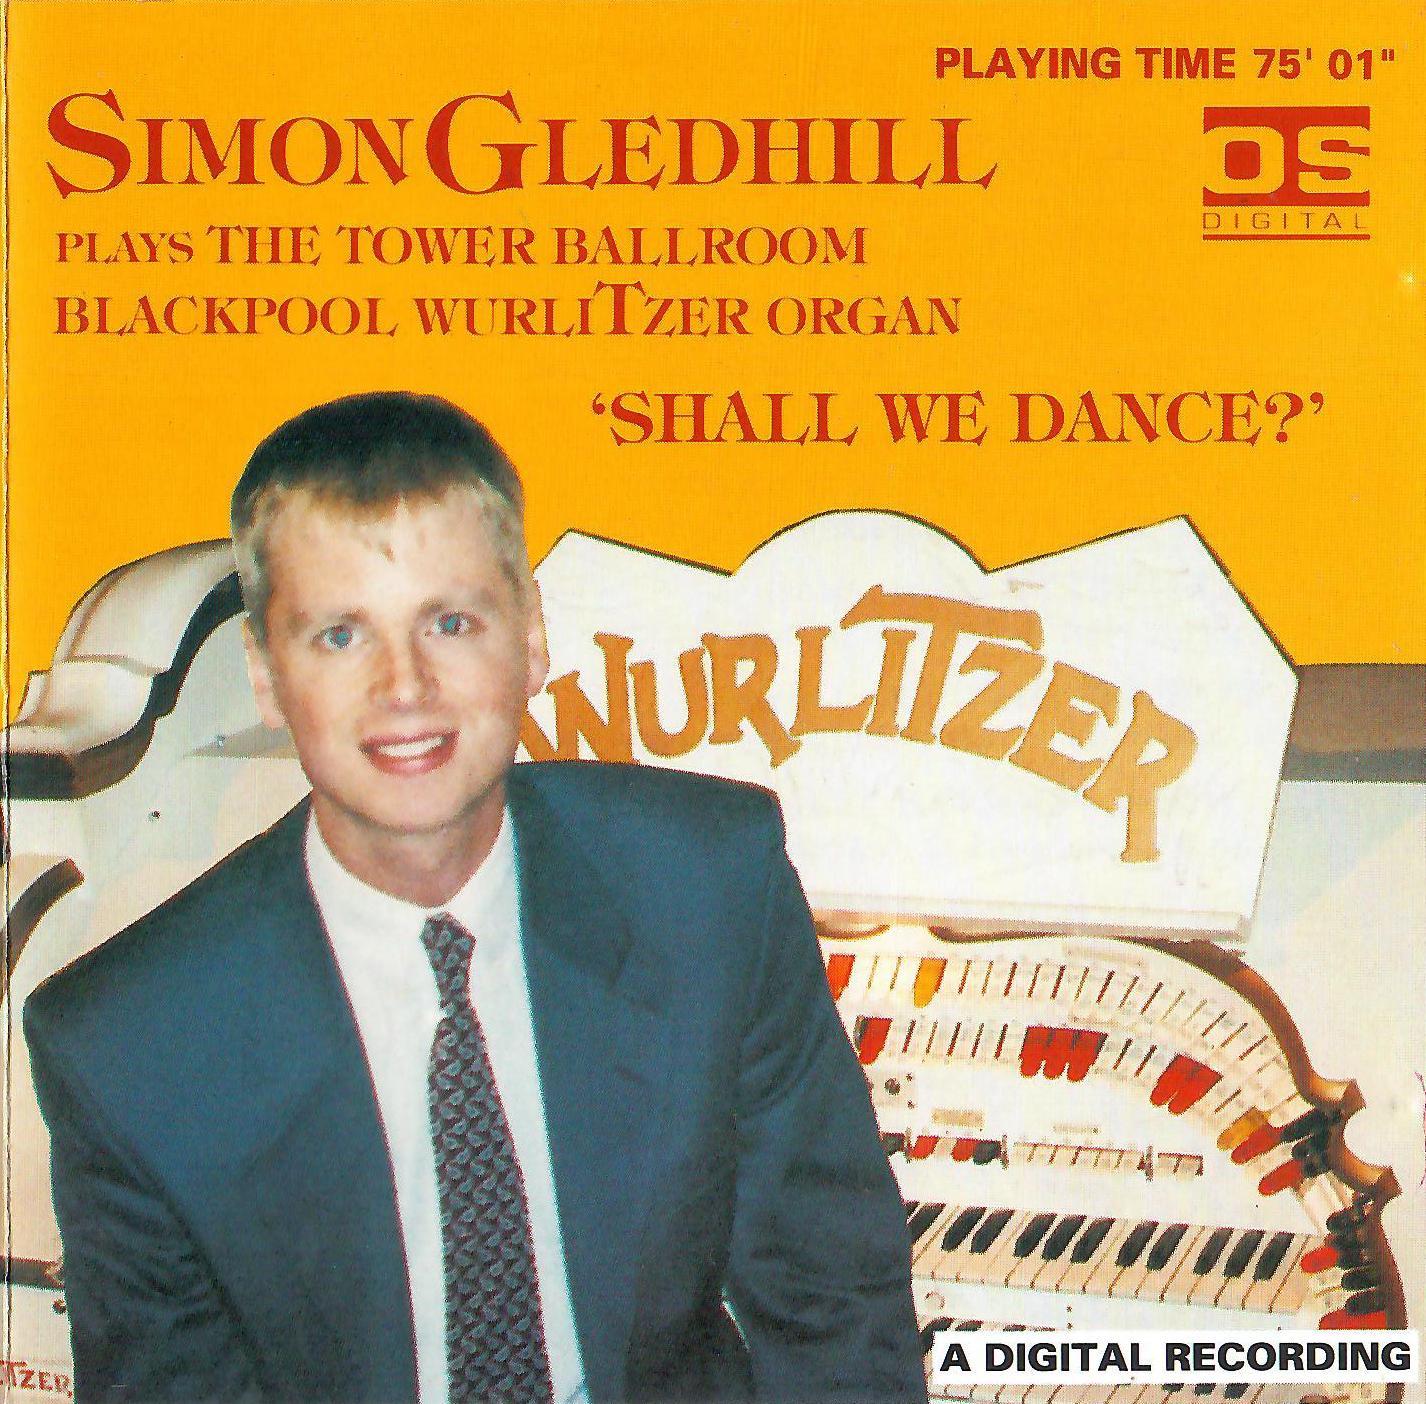 Simon Gledhill - Shall We Dance?